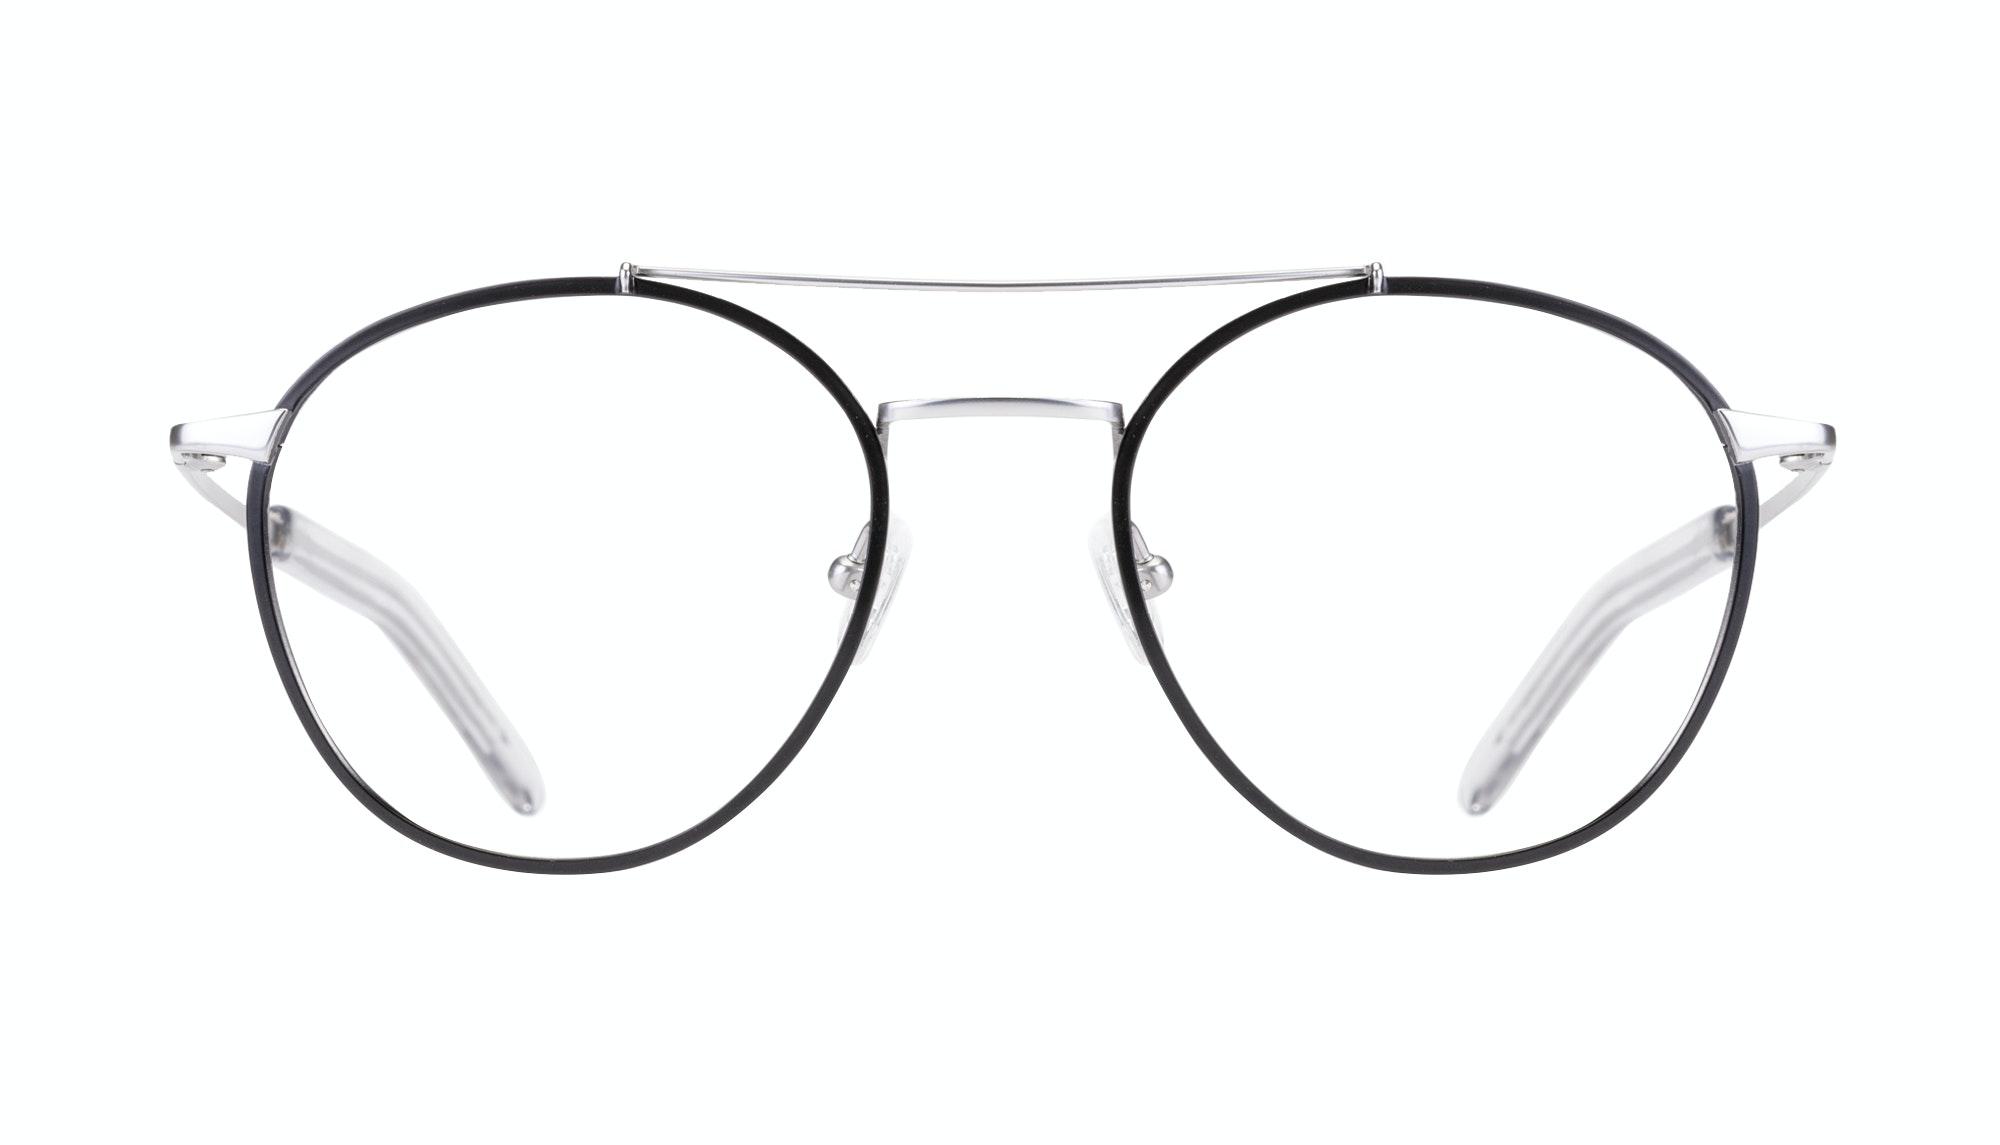 Affordable Fashion Glasses Aviator Eyeglasses Men Gravity Black Silver